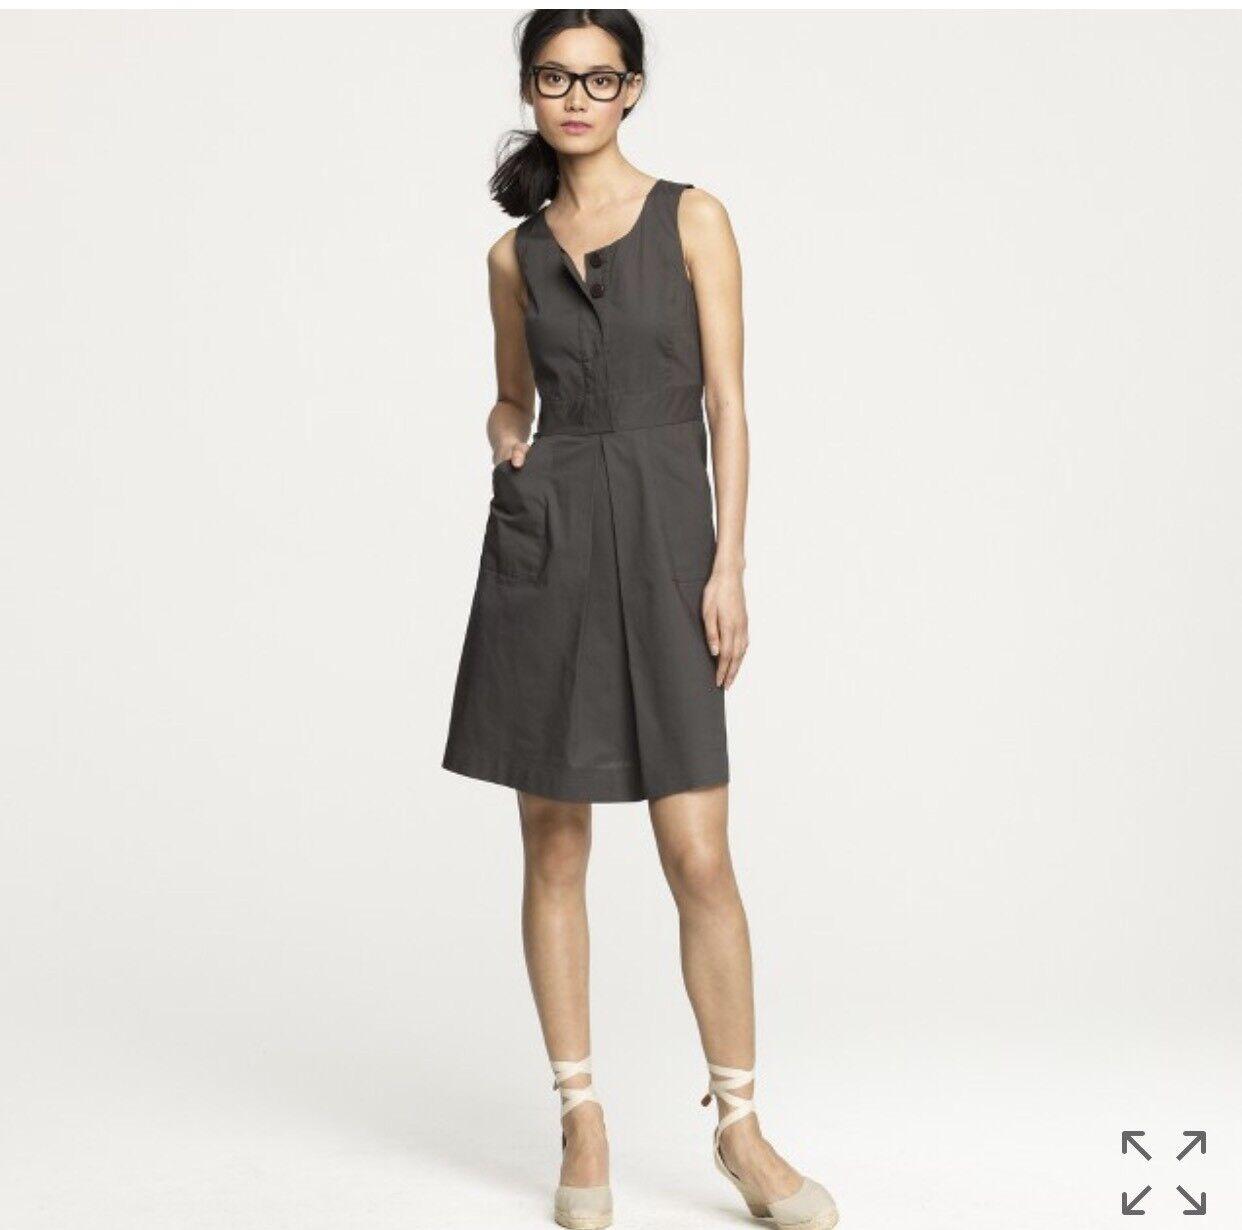 J CREW Olive Green Dress Size 8 A Line Caroline Cotton Sleeveless